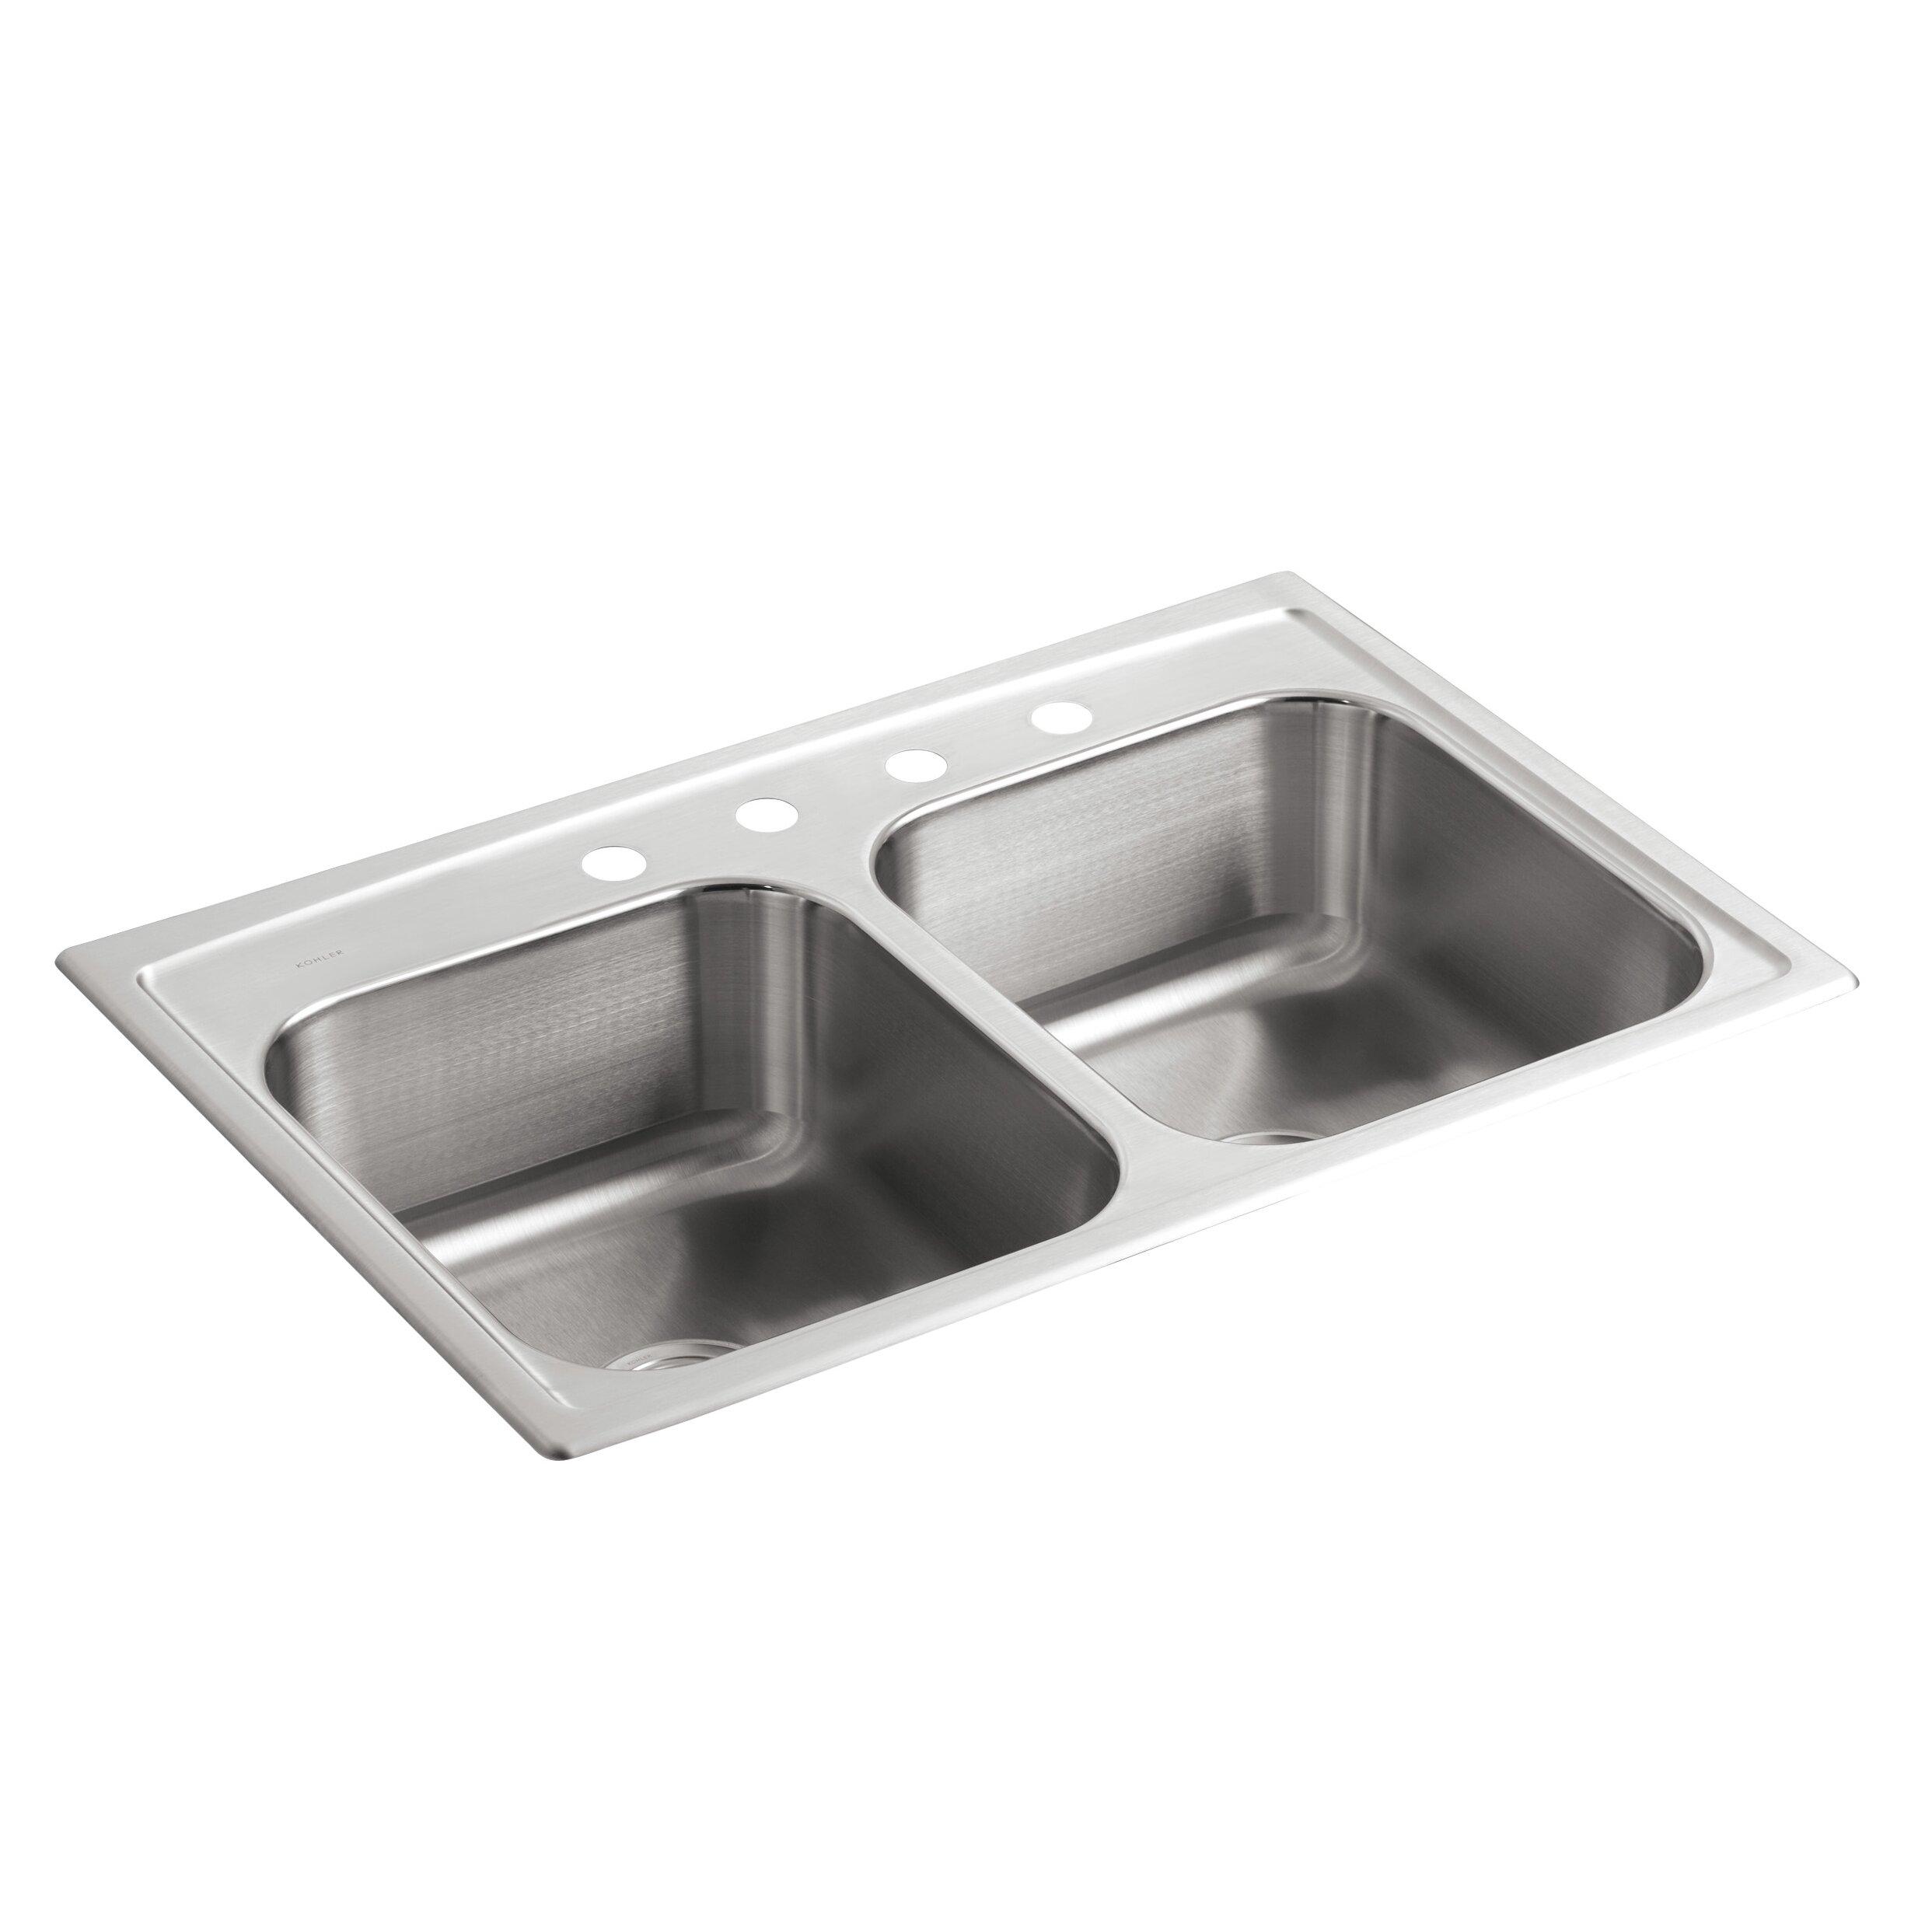 Kohler Double Sink : Kohler Toccata 33